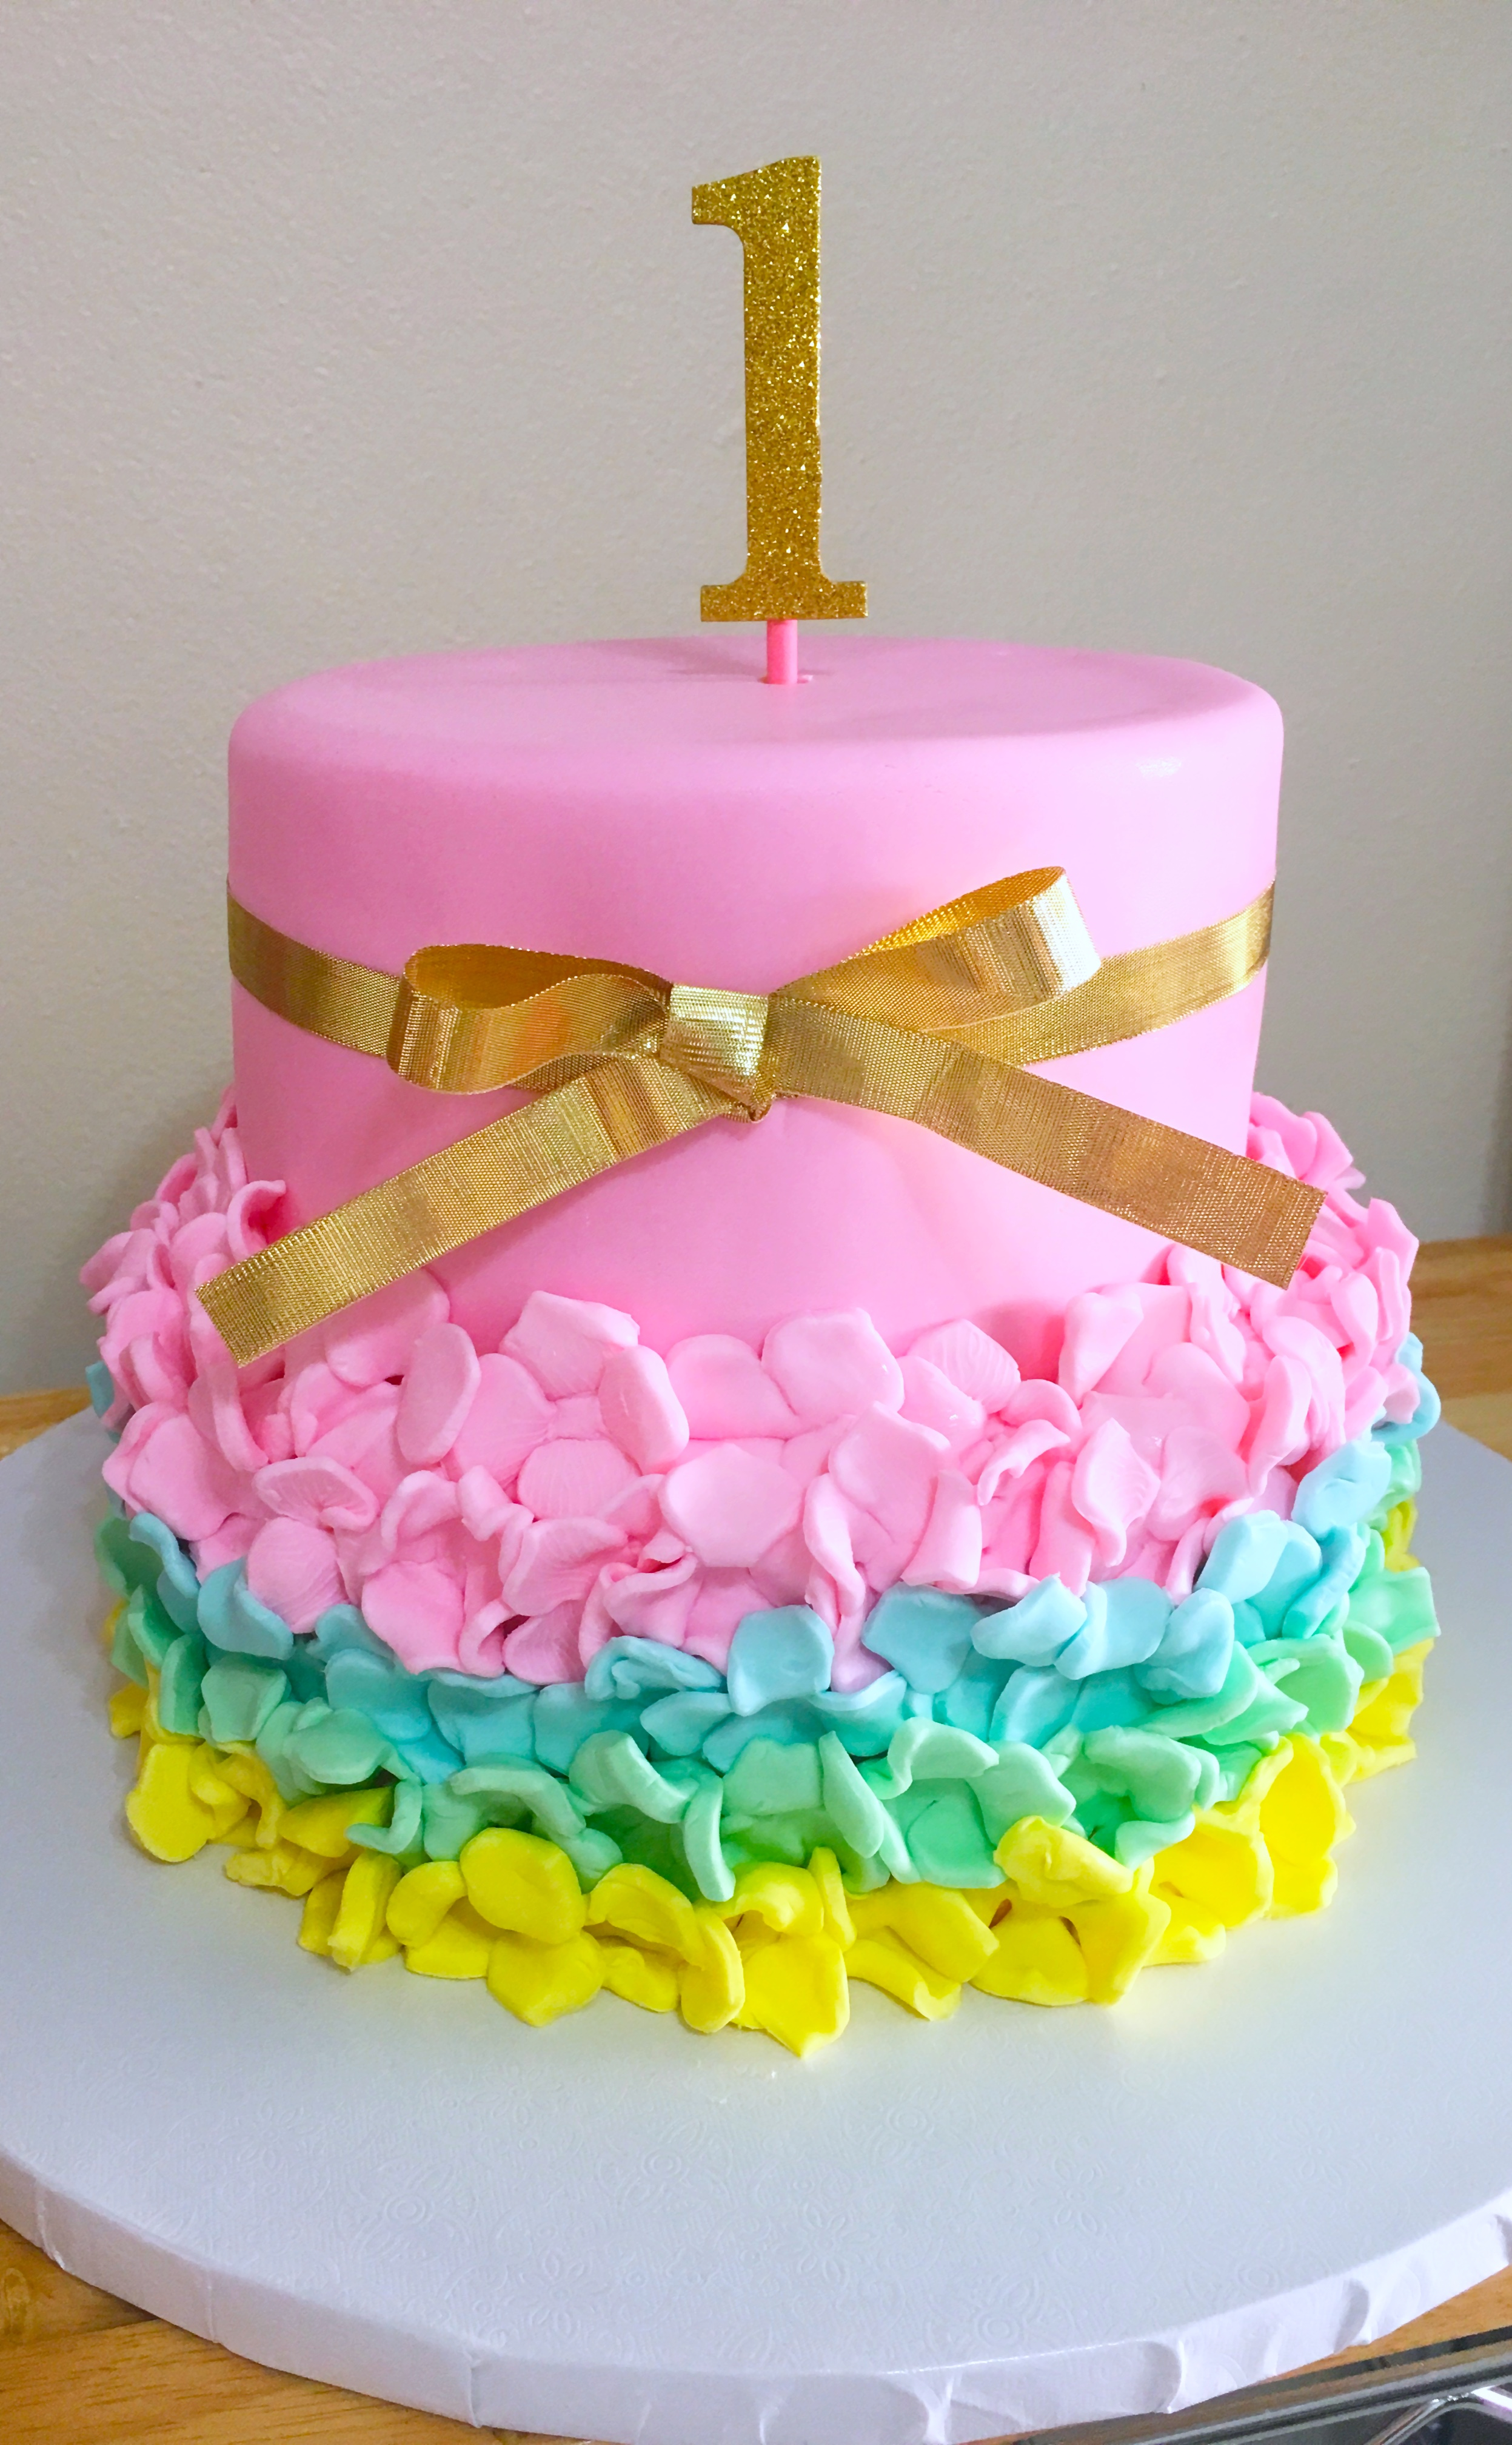 Rainbow Skirt First birthday cake